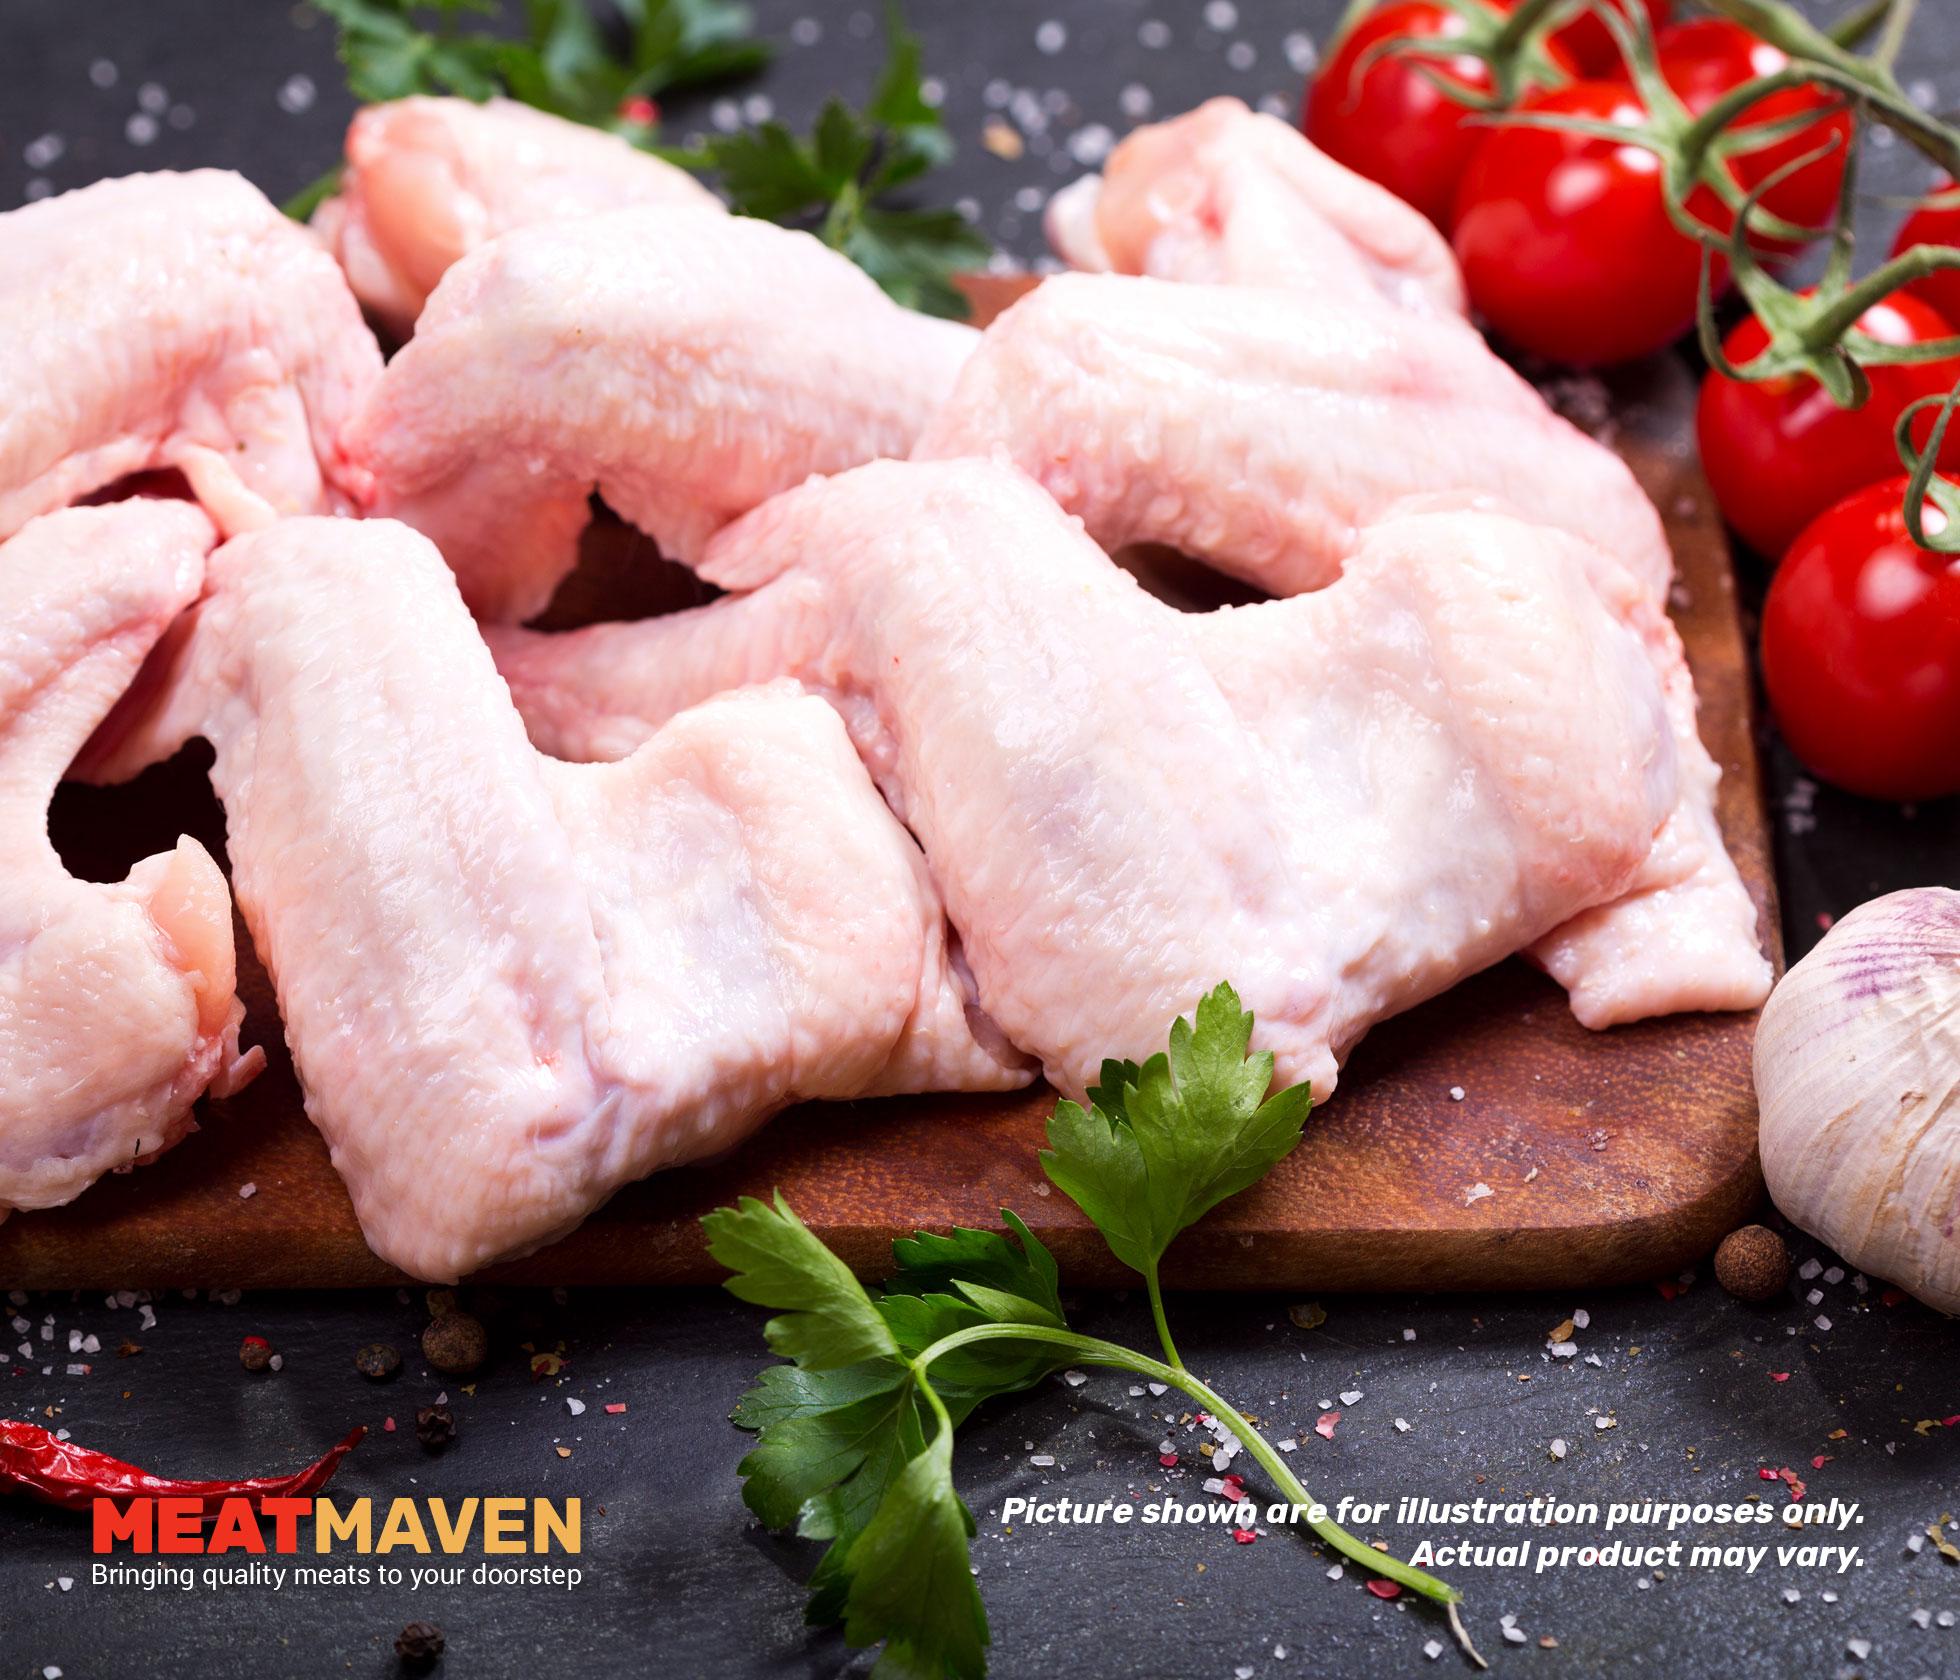 Whole Chicken Wings 1 Kg Meat Maven Diagram Leg Detailed Wing Raw